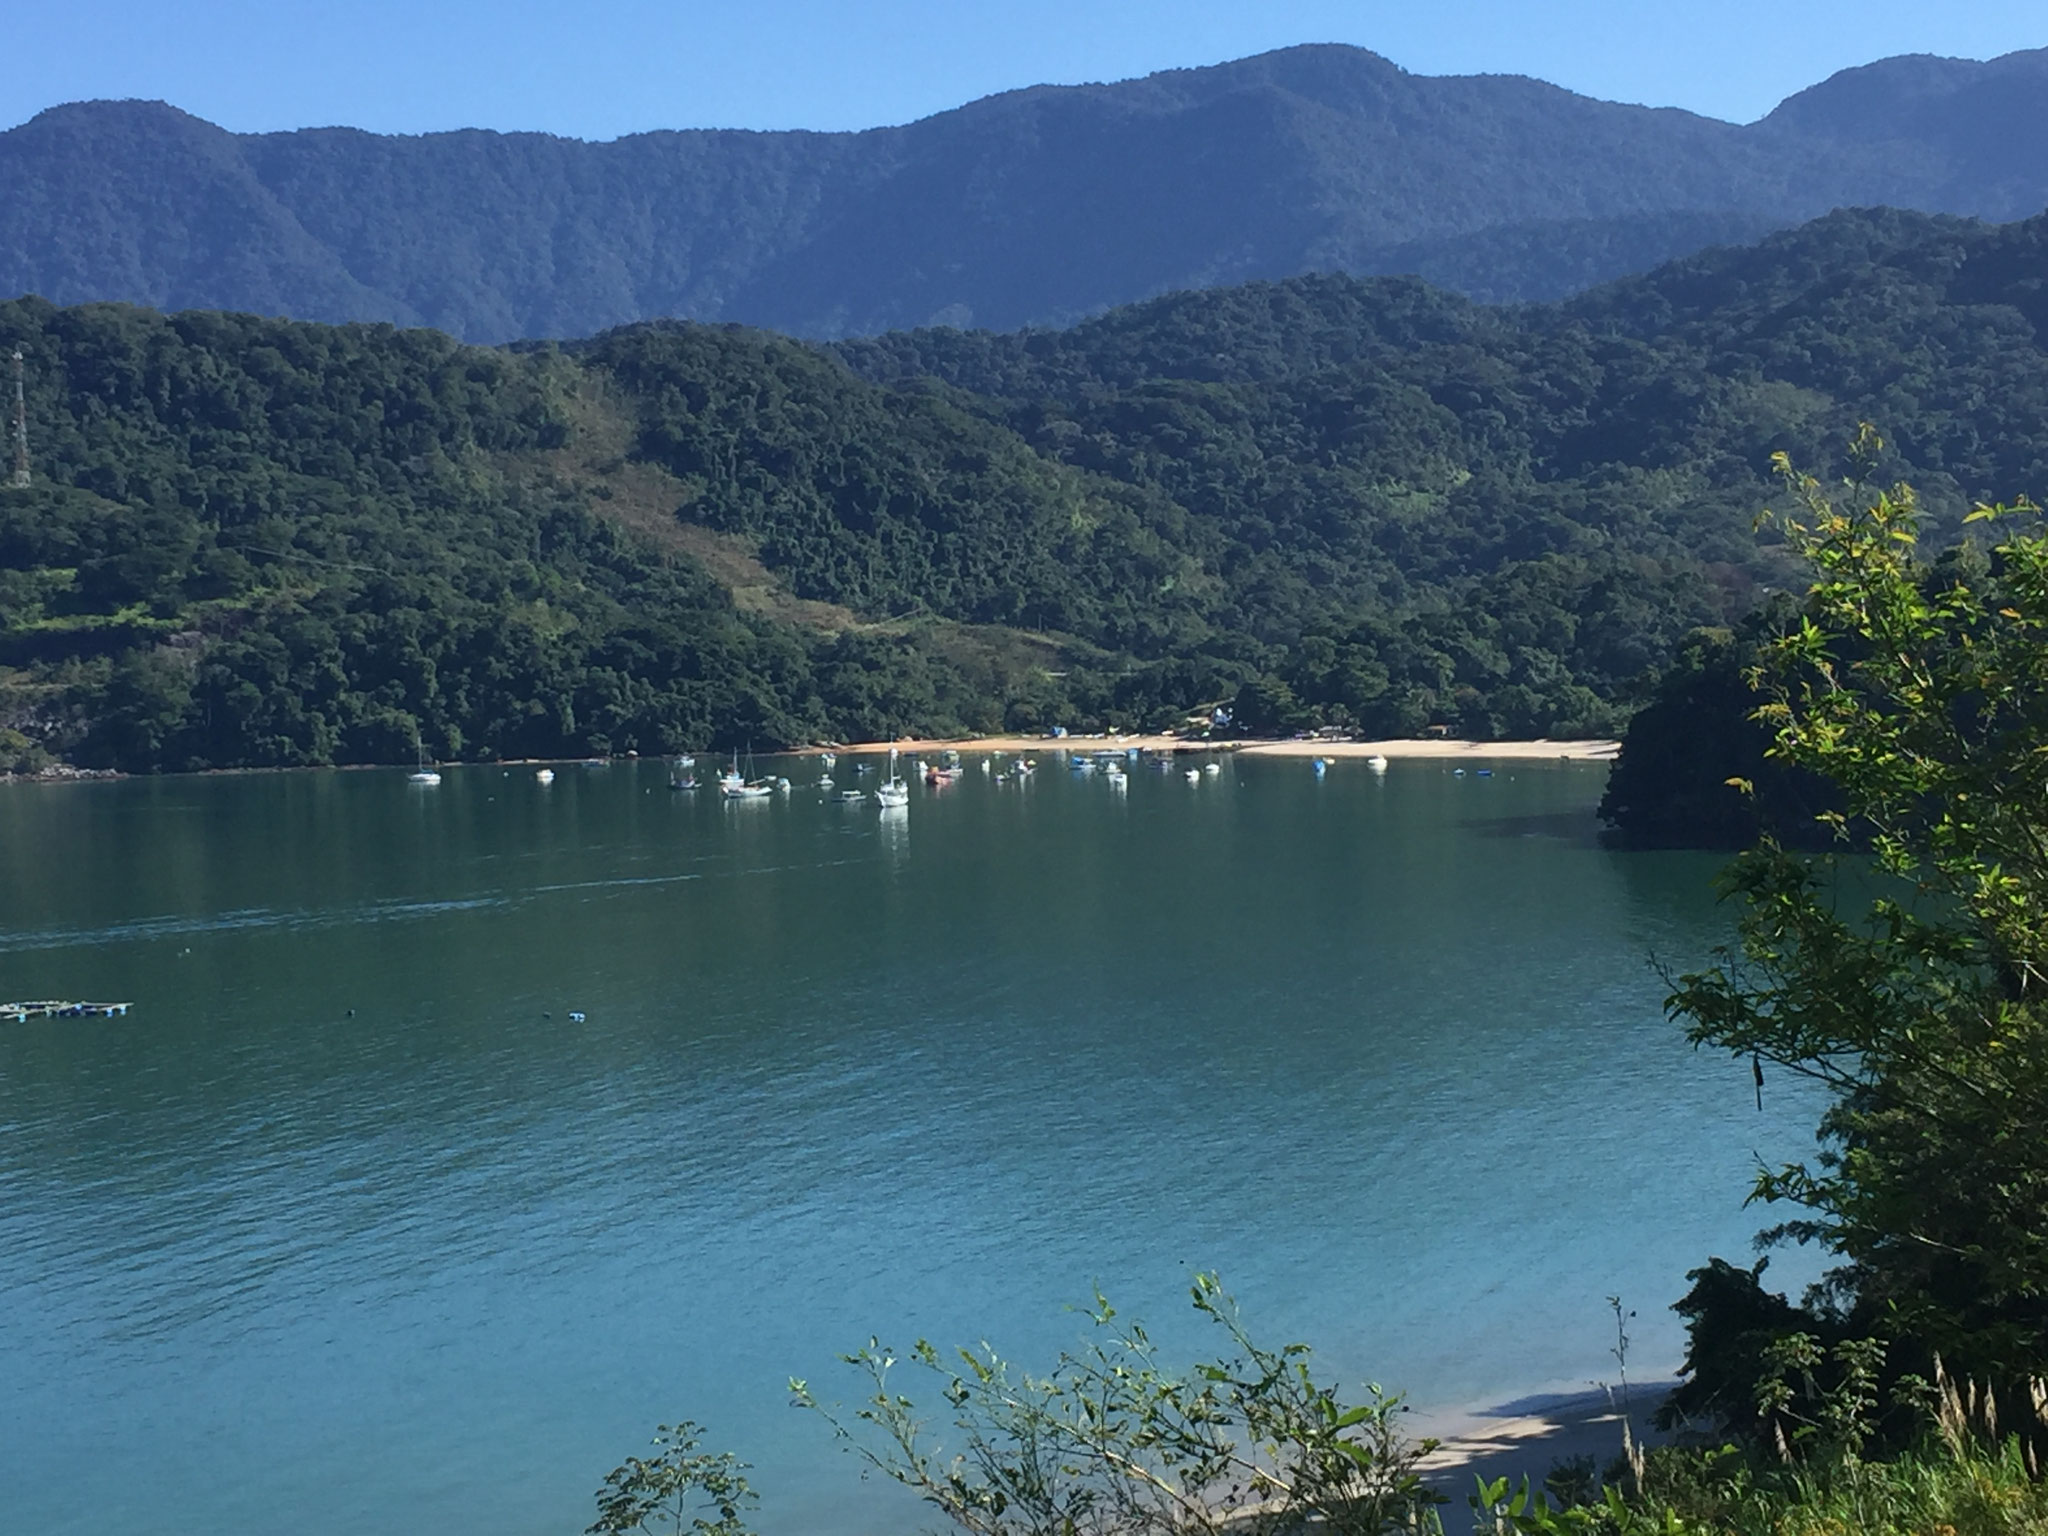 An der Küste entlang Richtung Rio